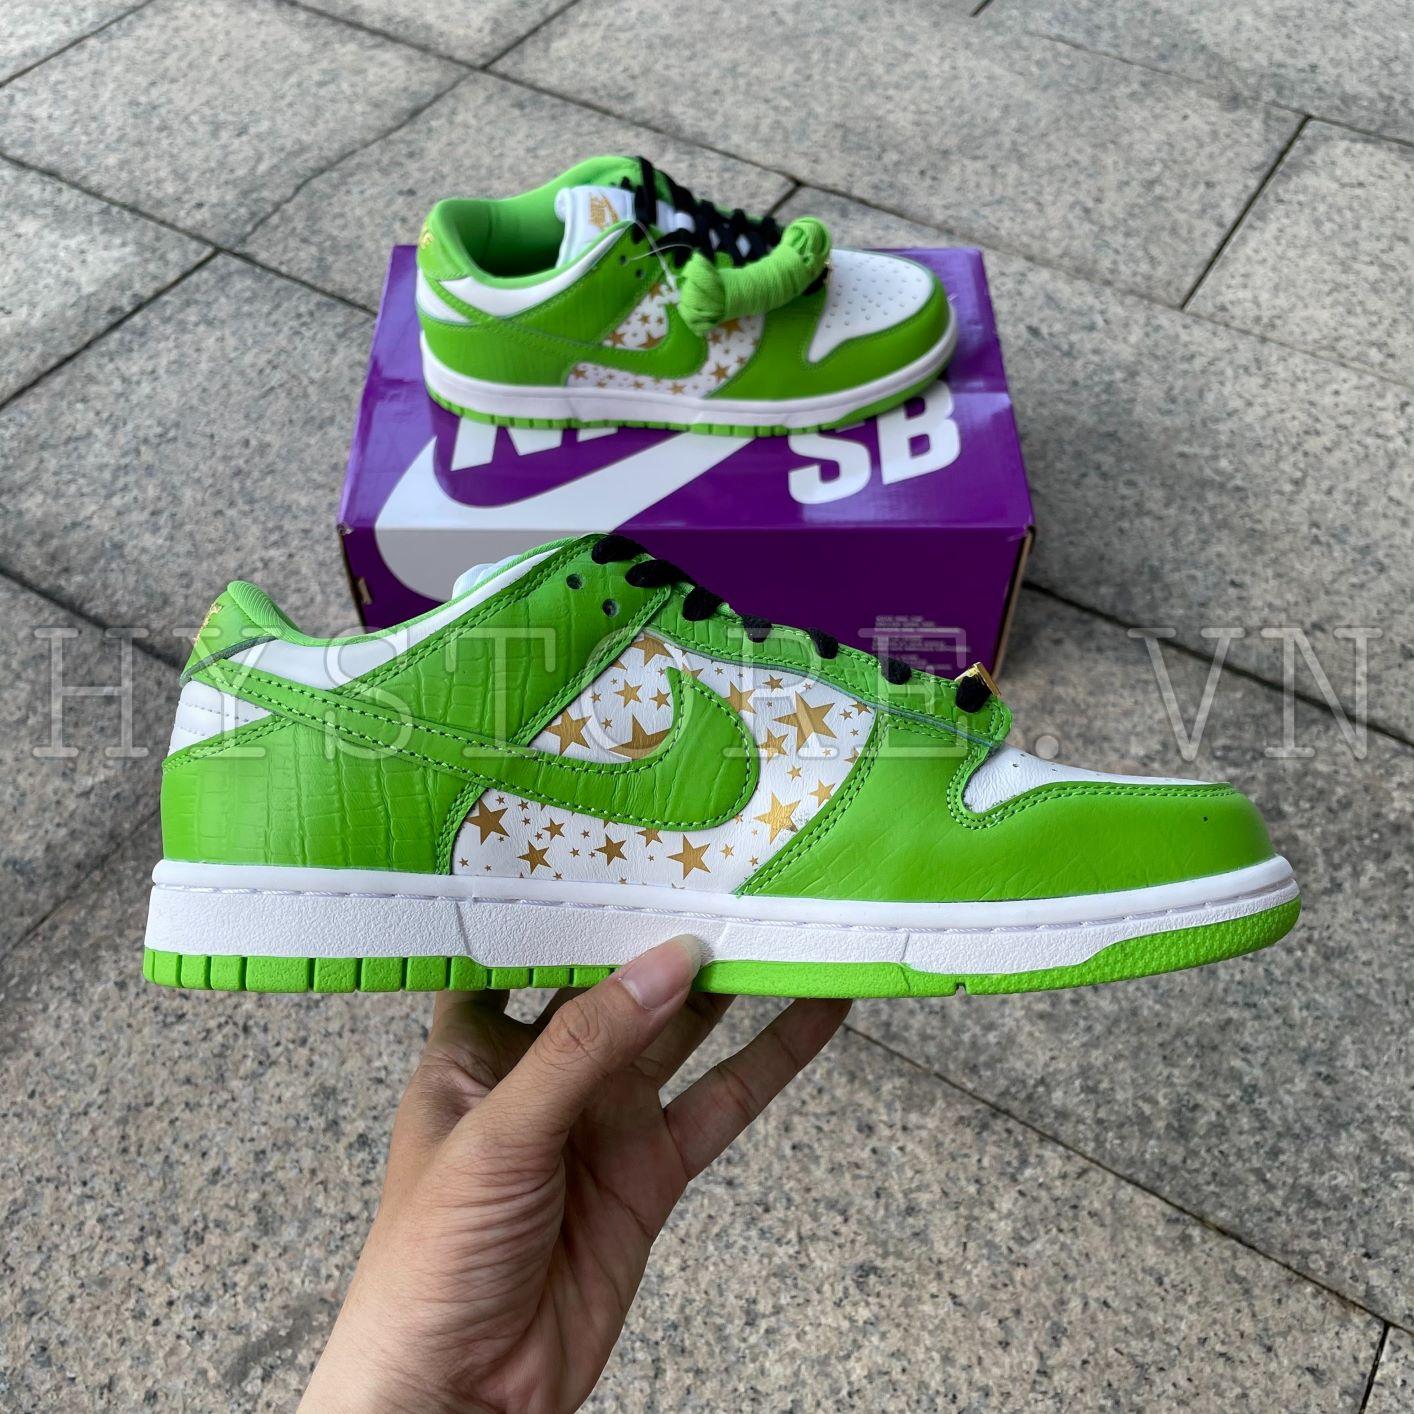 Giày Nike SB Dunk Supreme MeanGreen